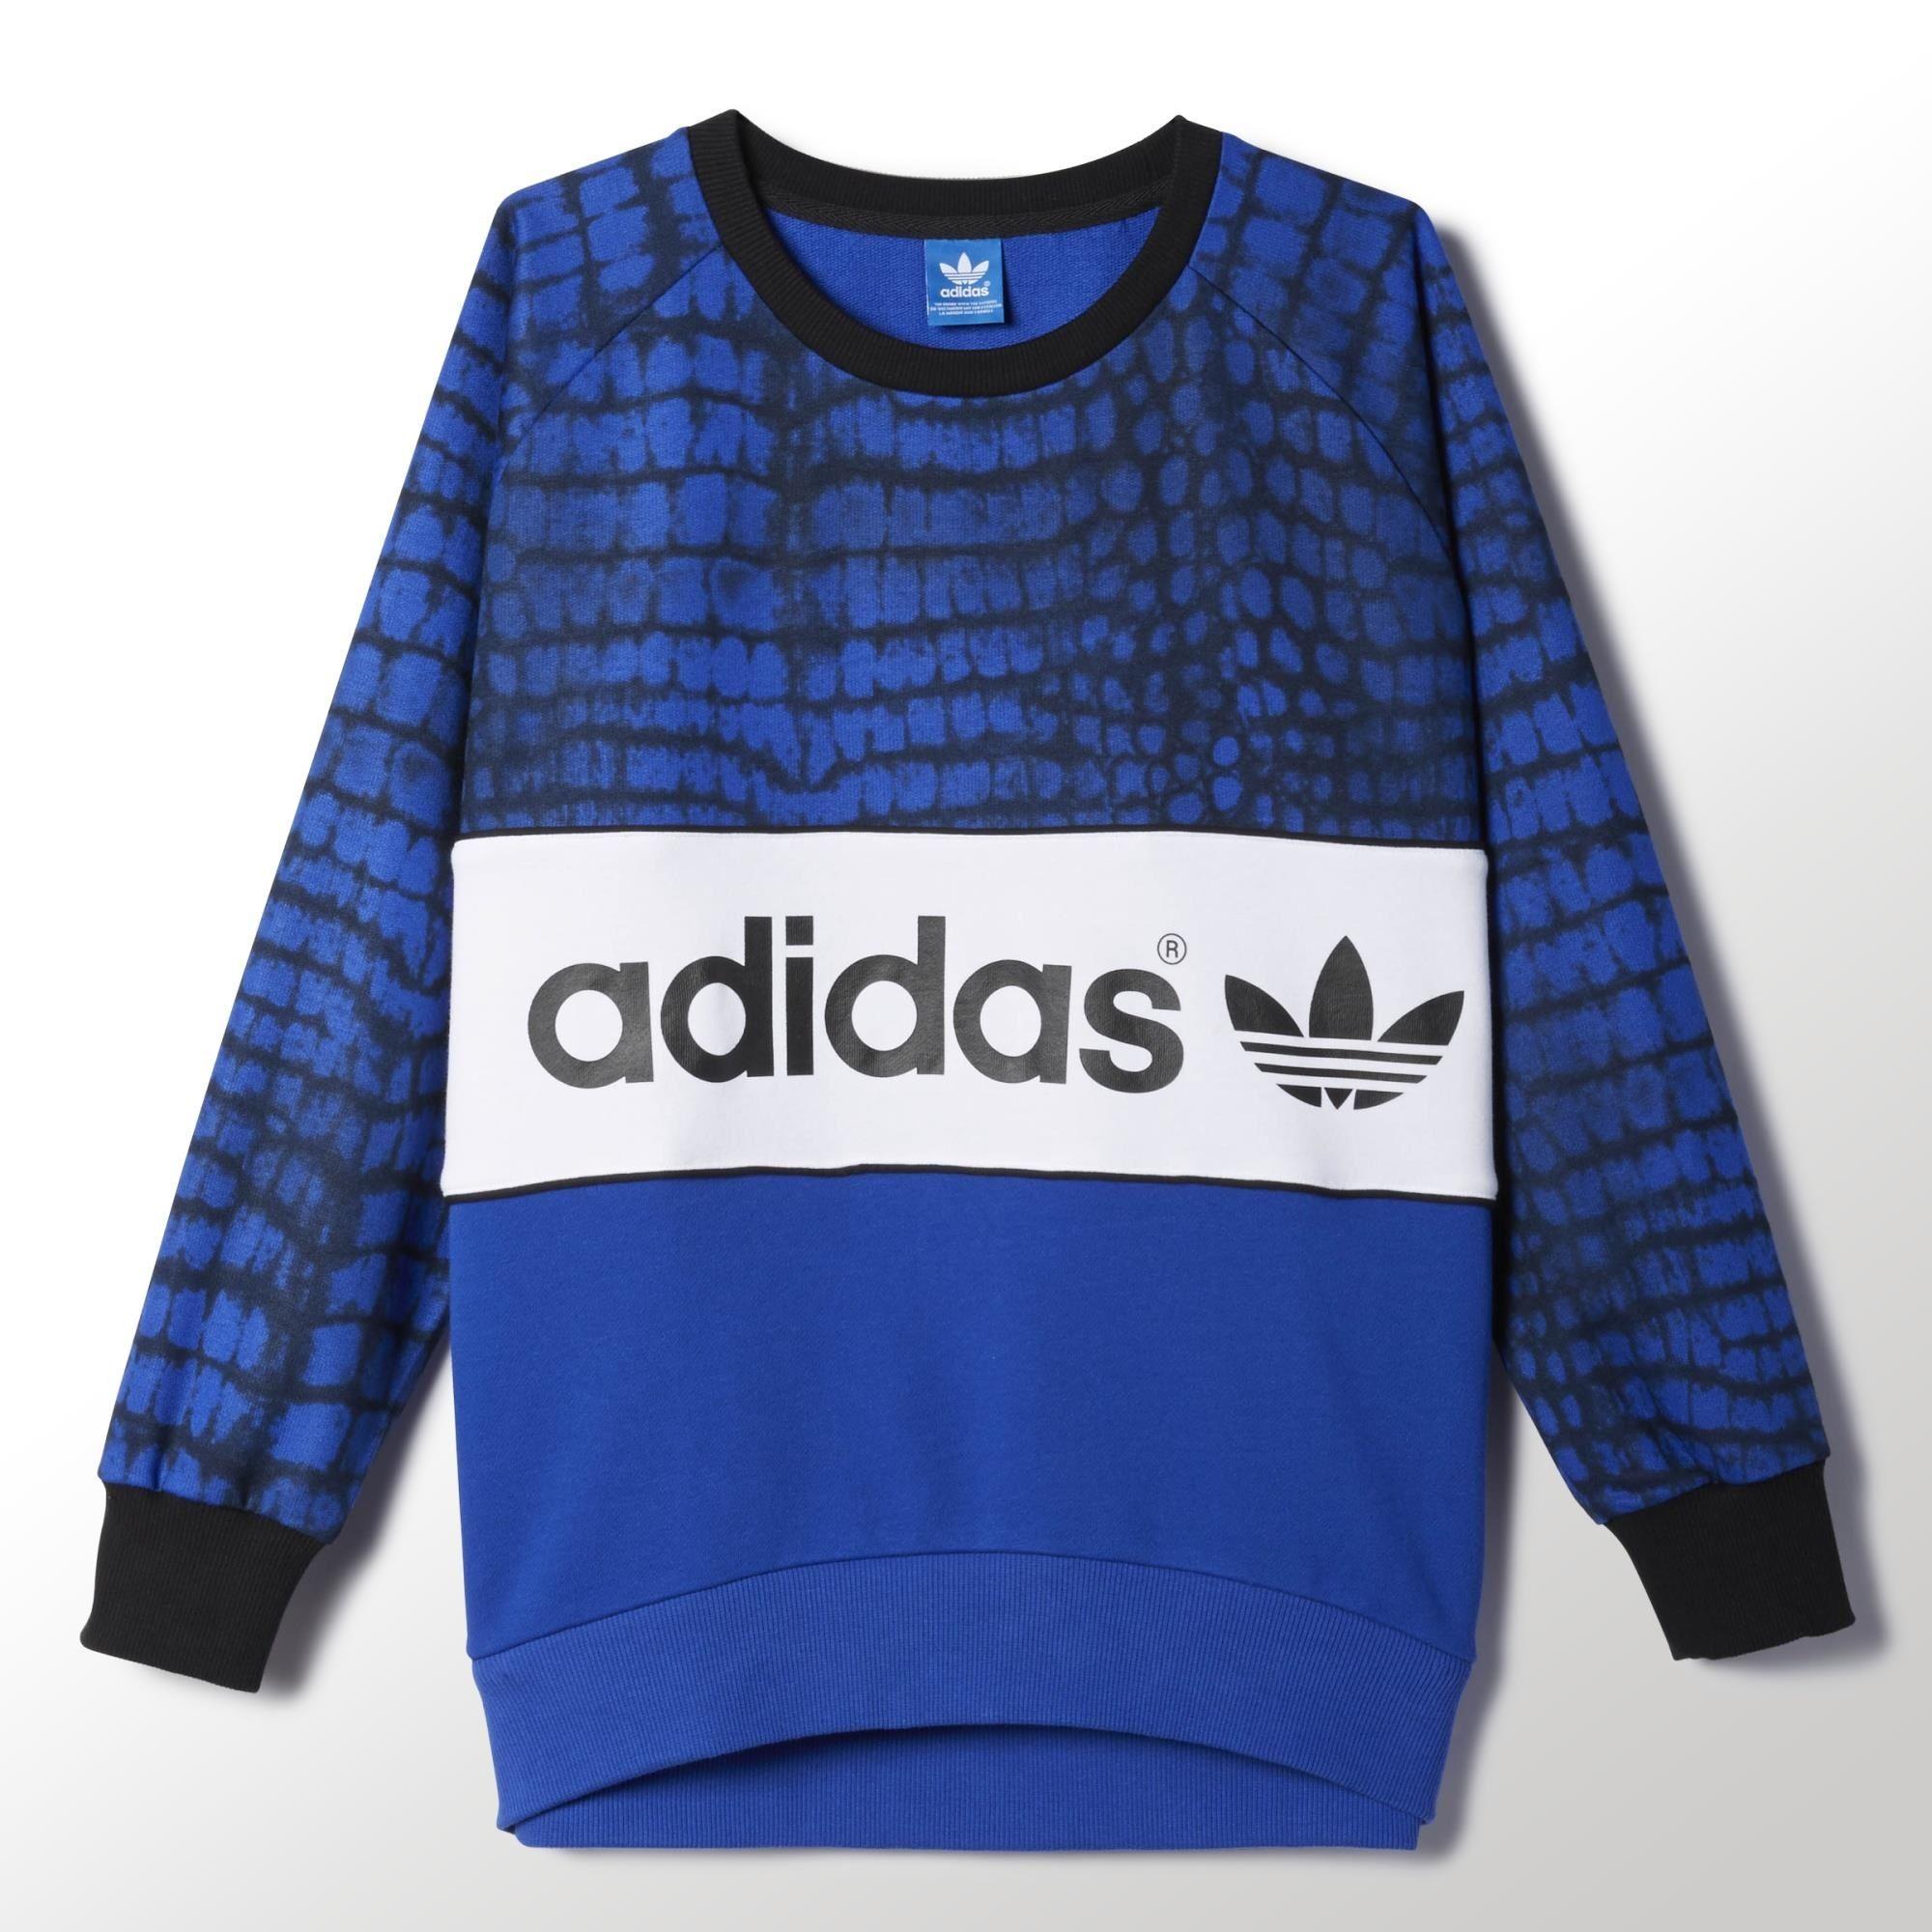 Mujer New azulblanconegro York Adidas Sweater City Originals axwft1tq5